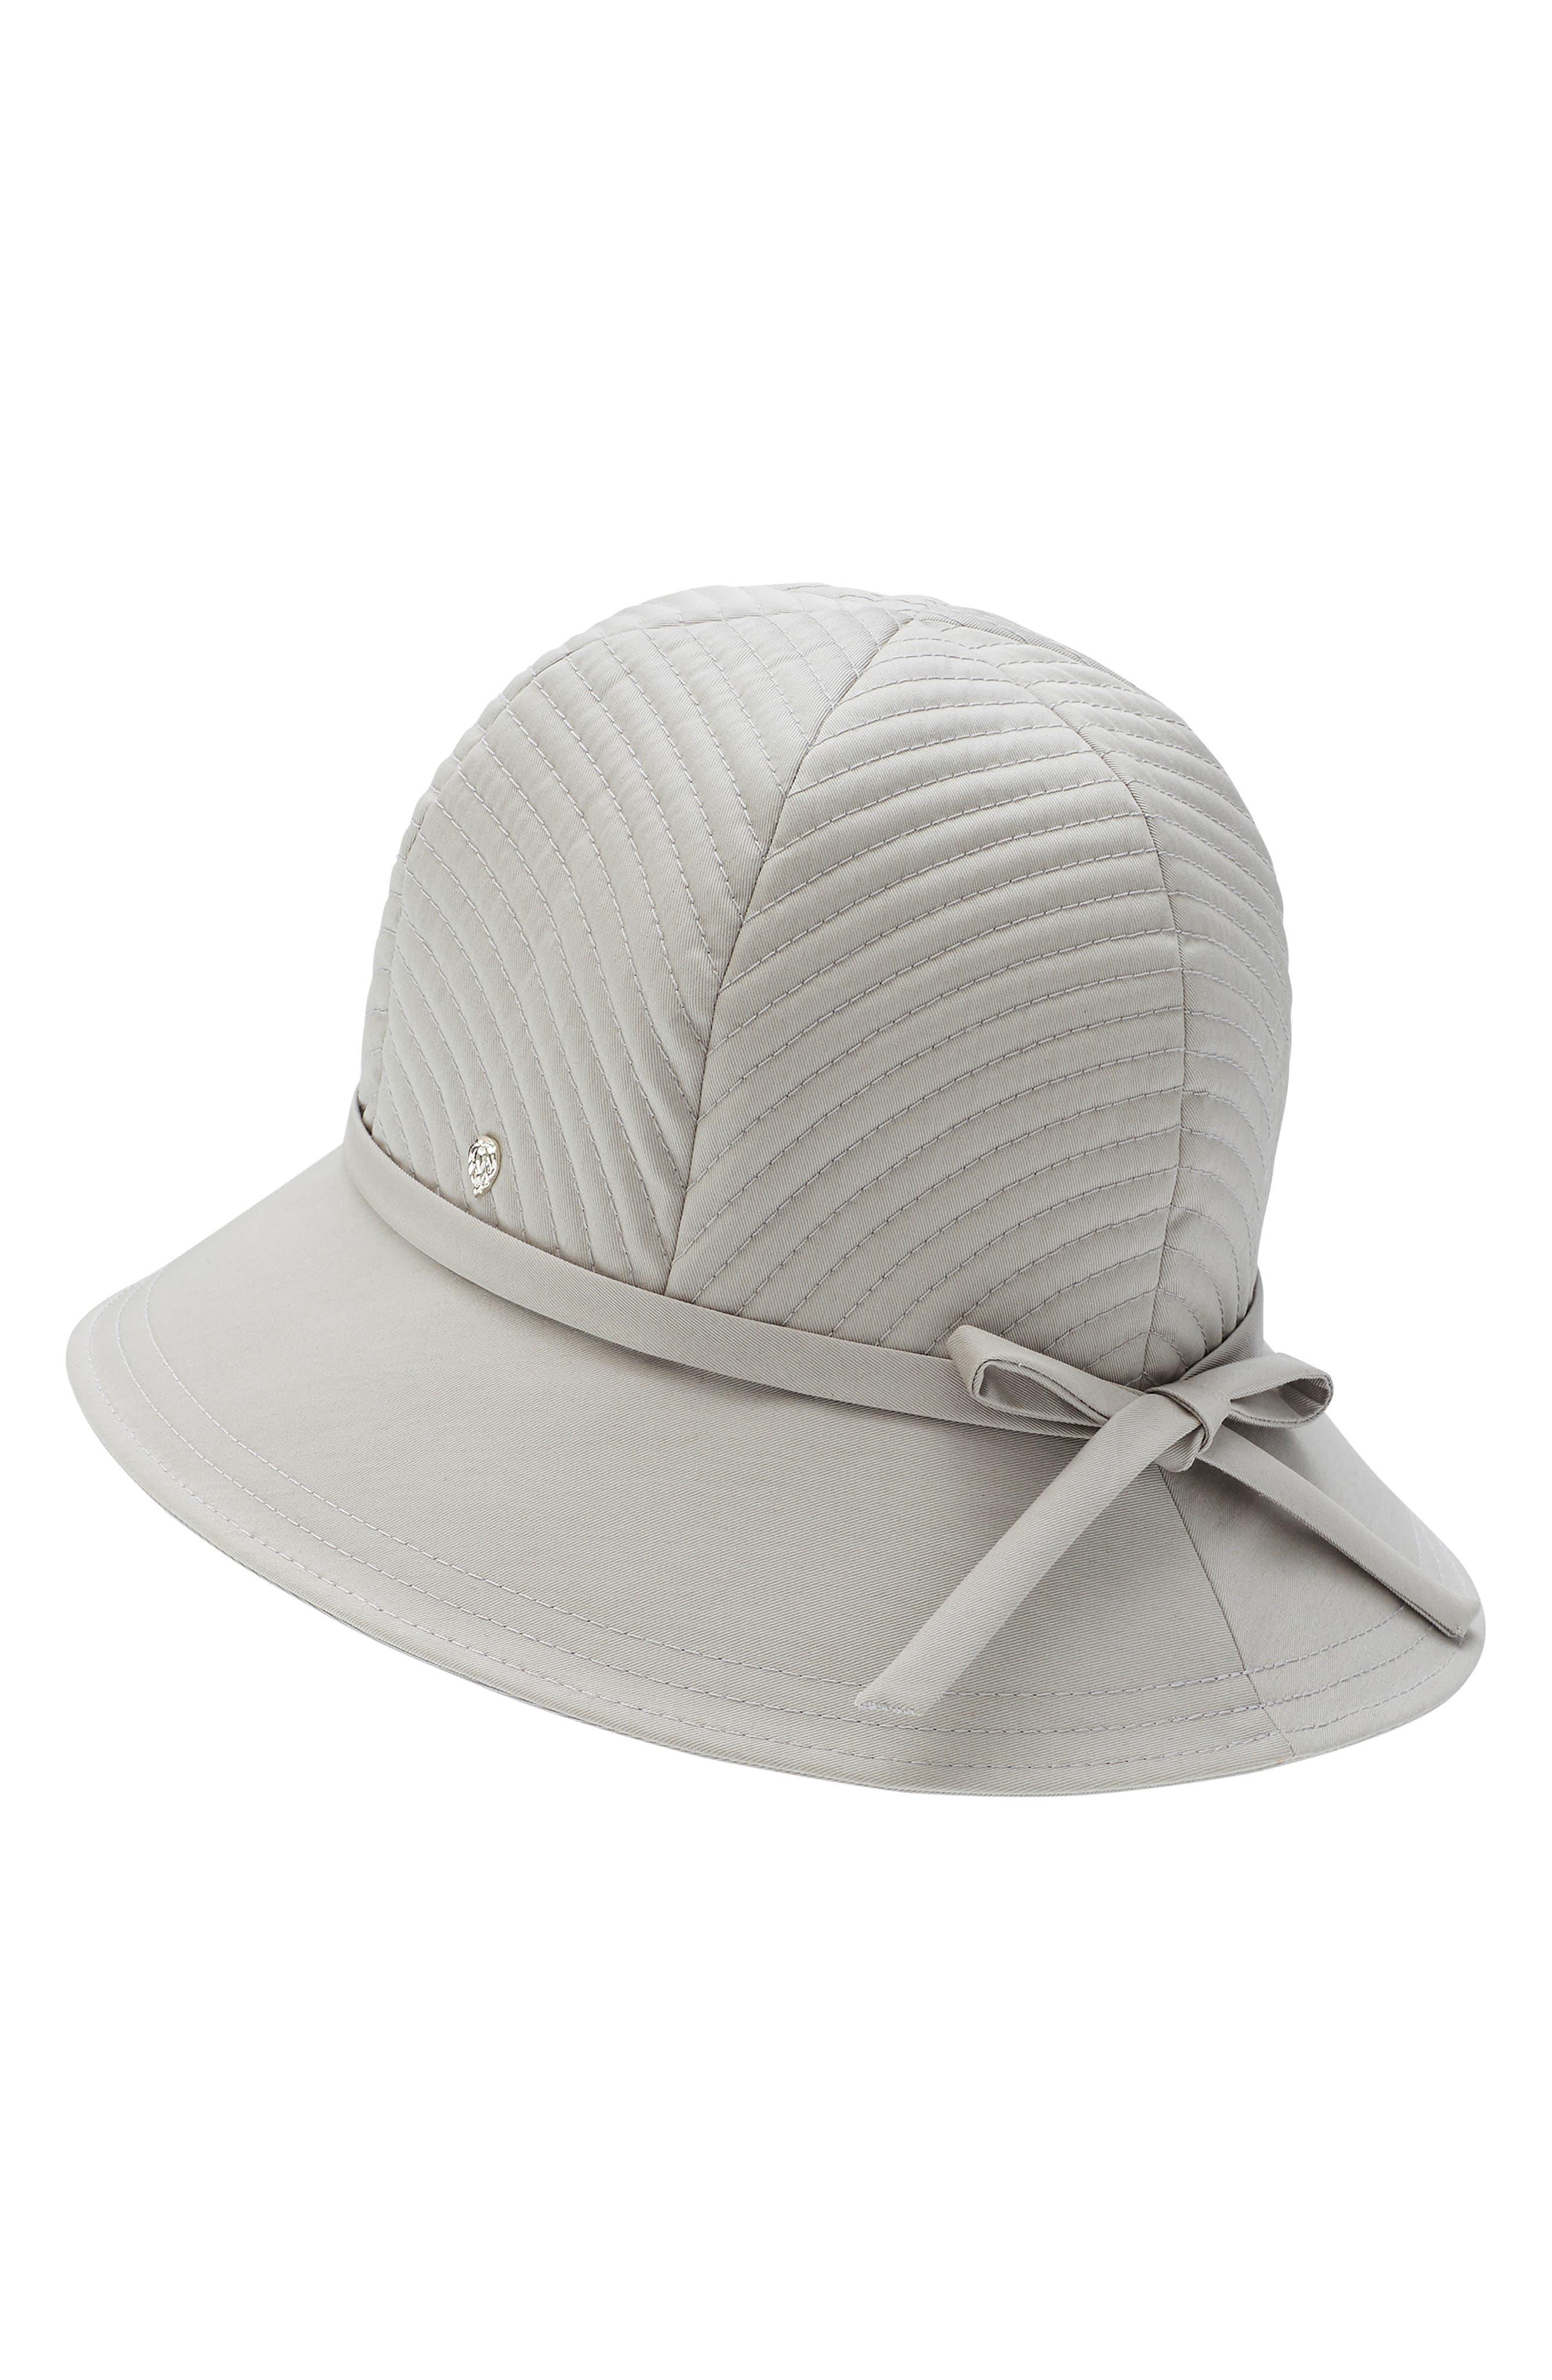 8d5c34e23a9 Grey Hats for Women